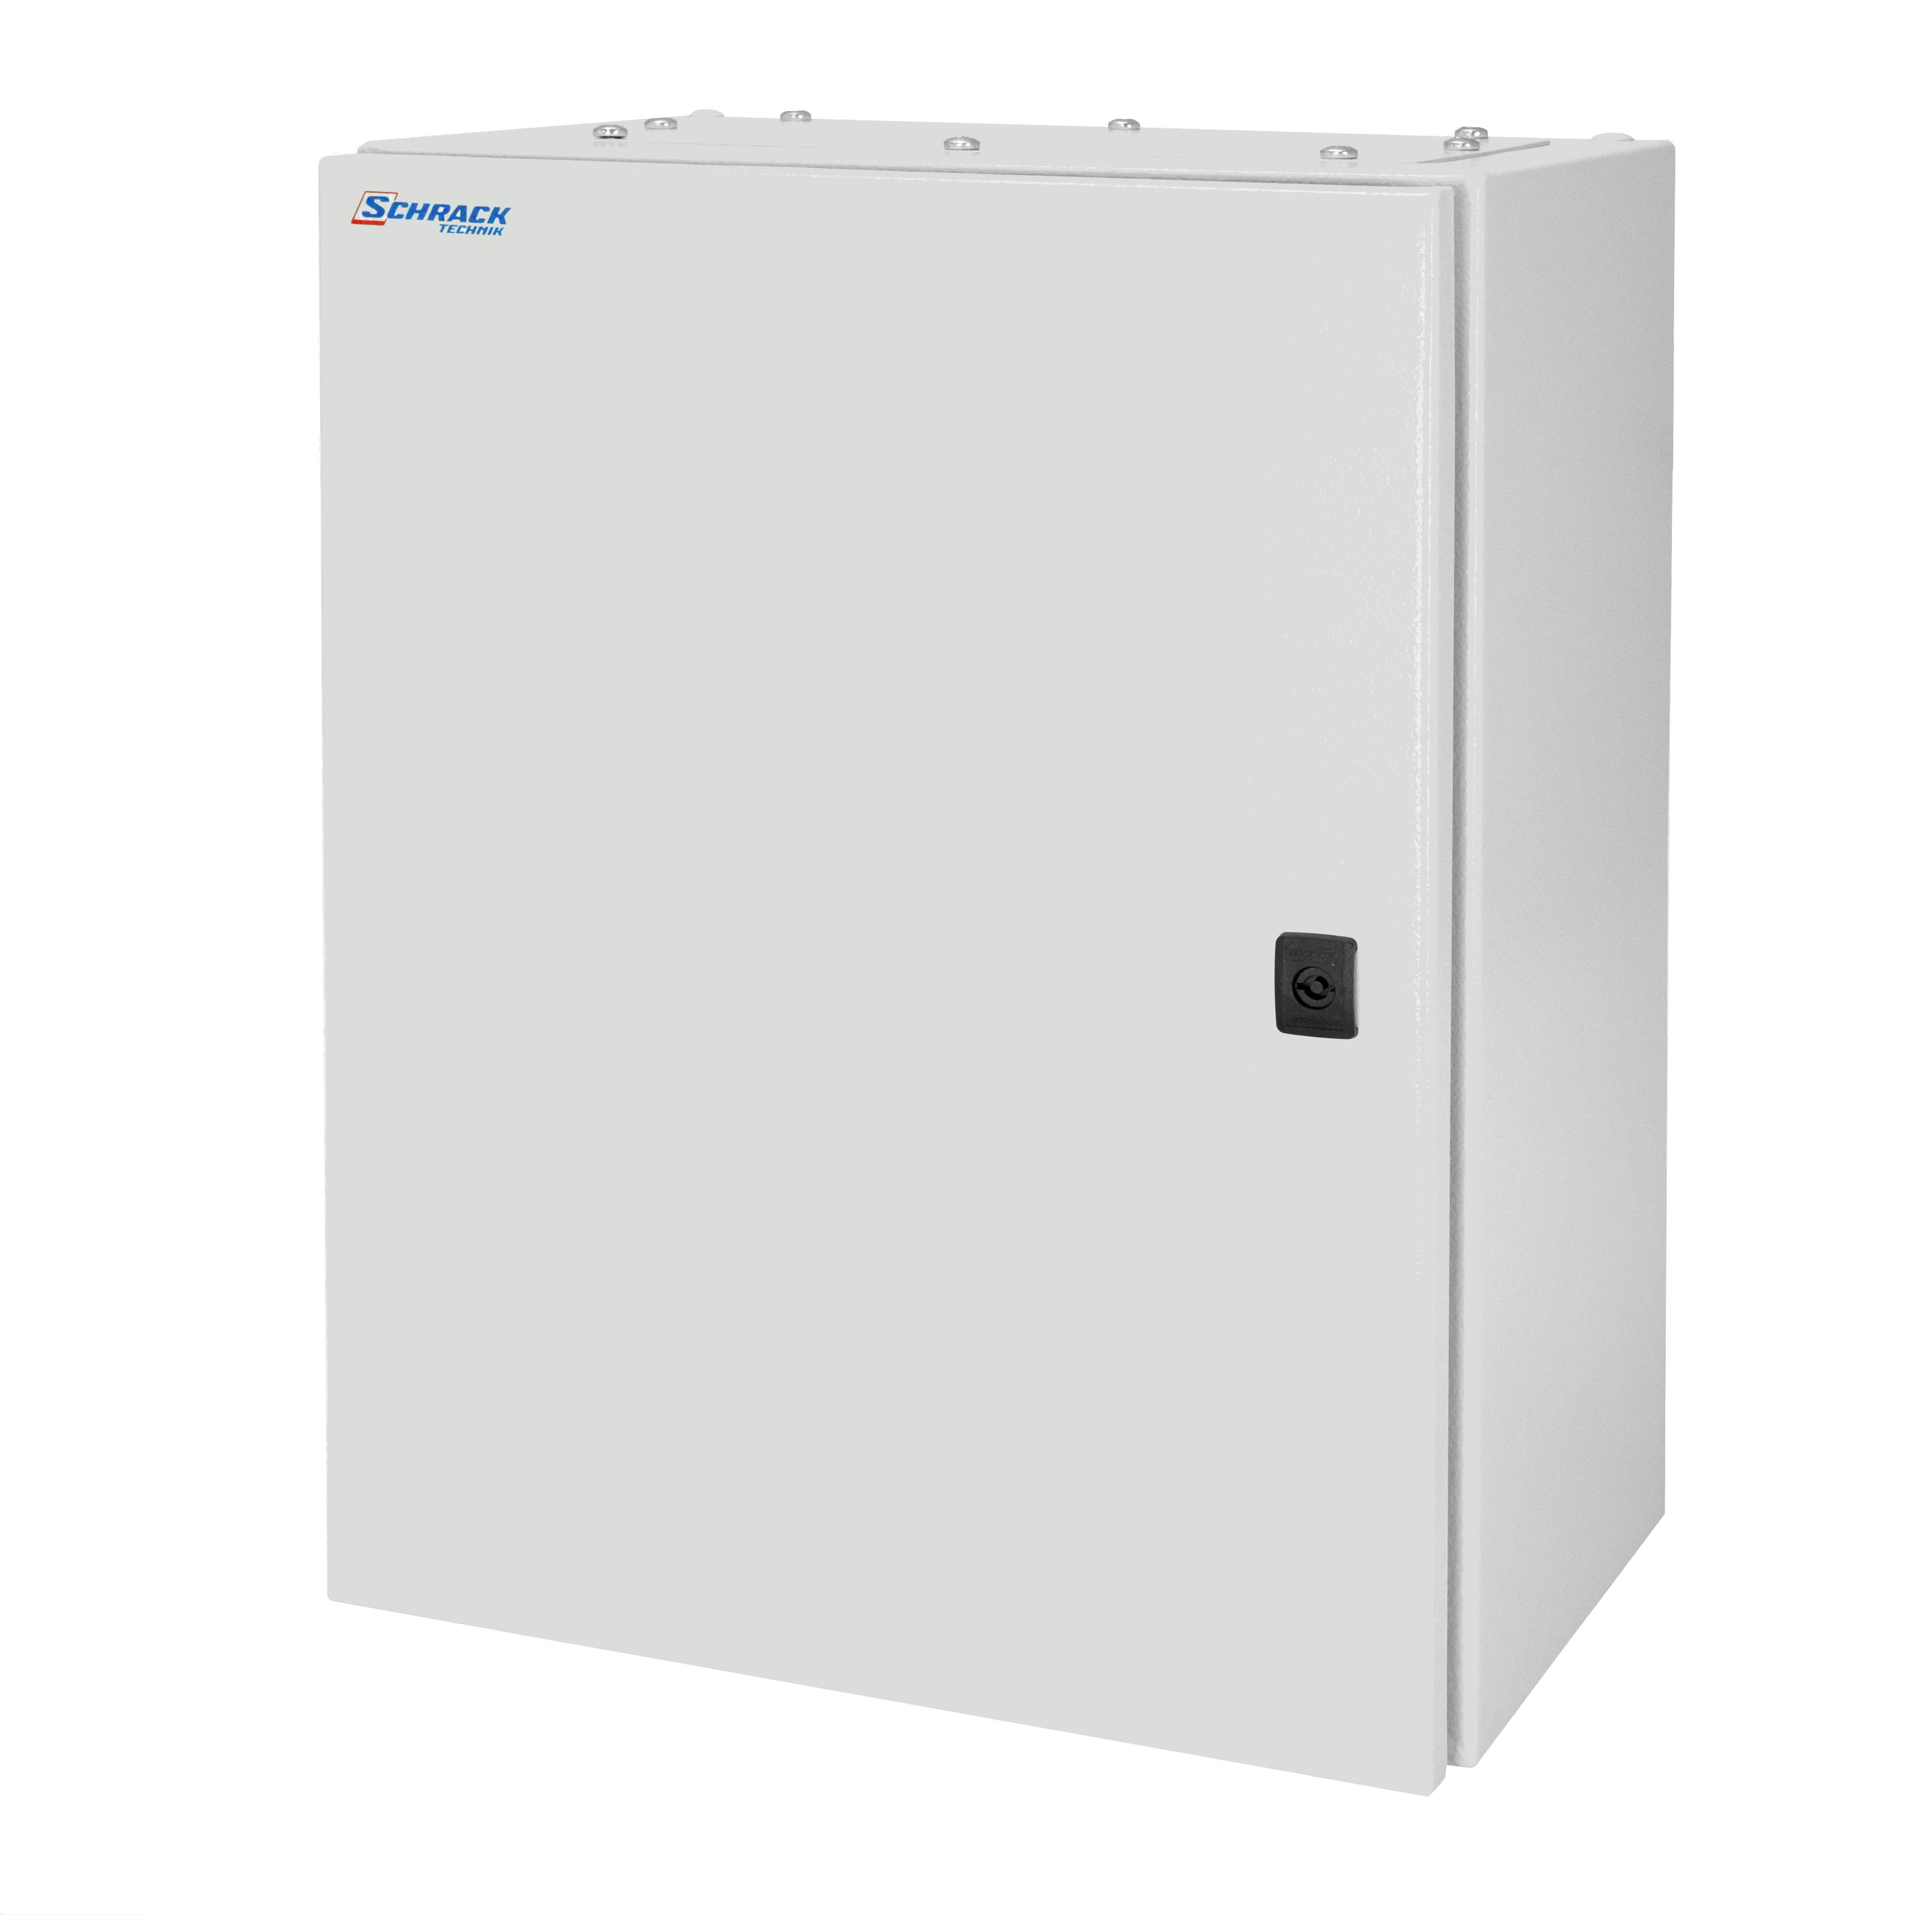 1 Stk Wandschrank Mono IP66 H=300 B=300 T=210 Stahlblech WSM3030210